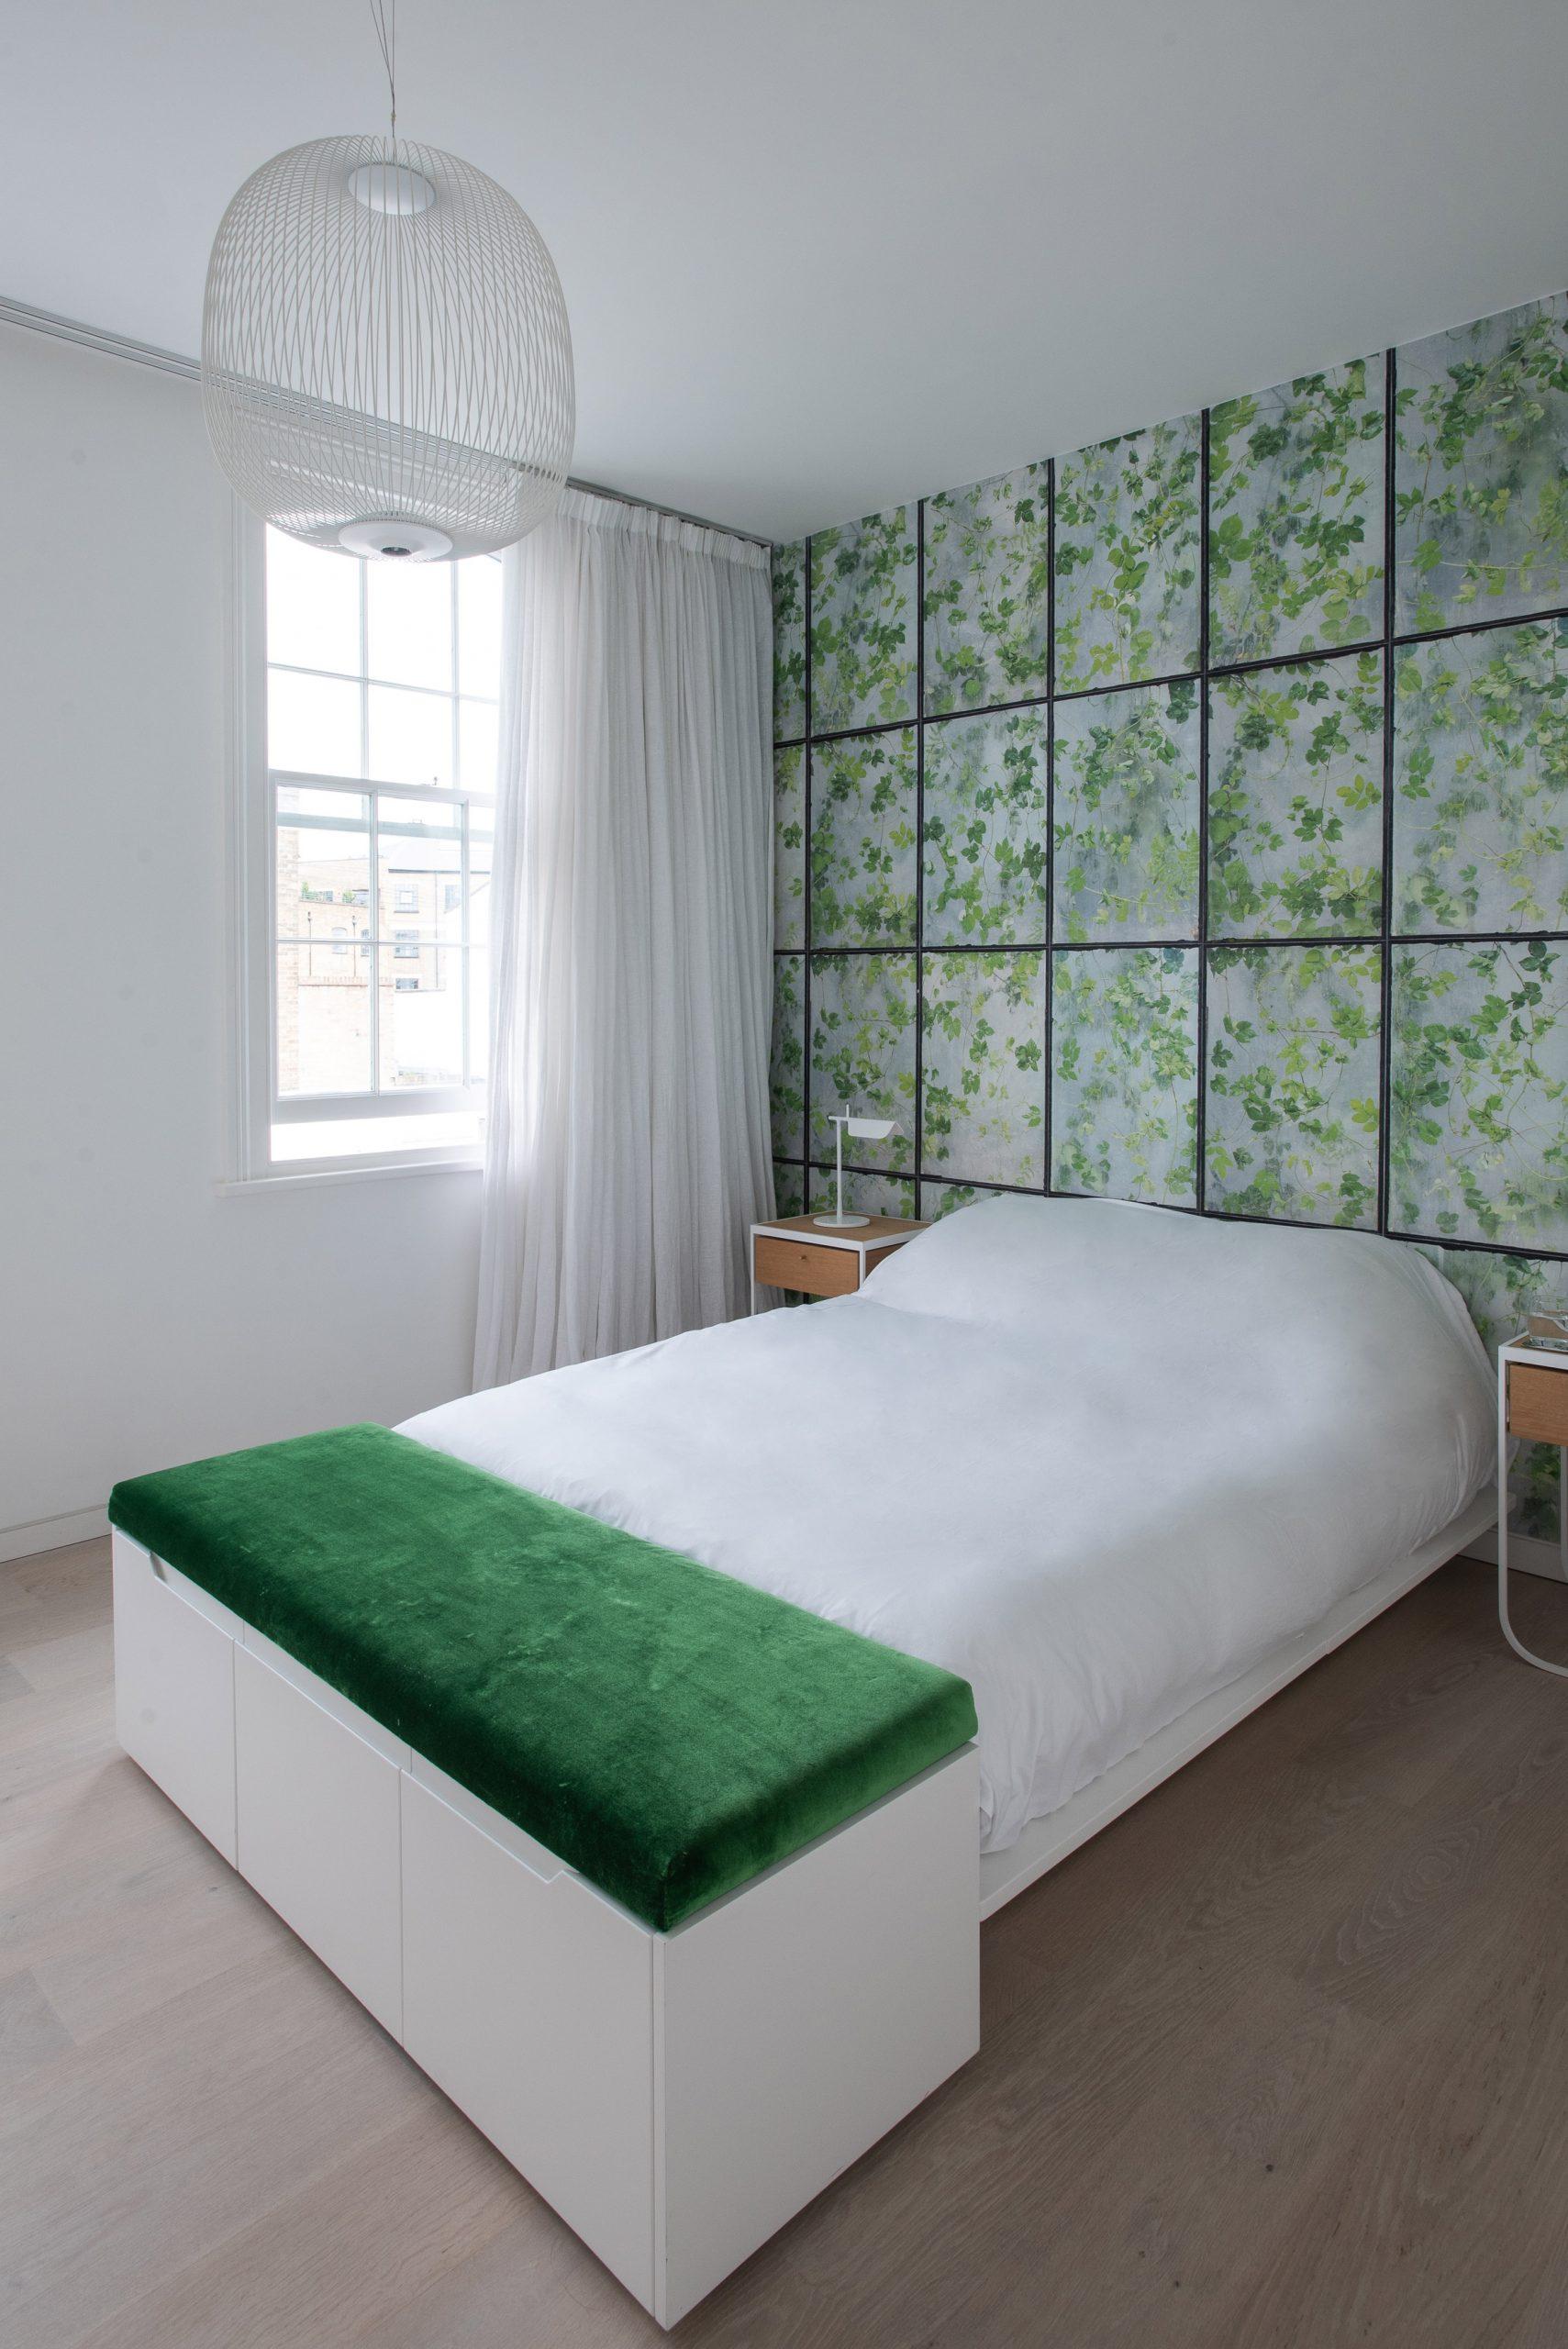 The bedroom employs a similar minimal look